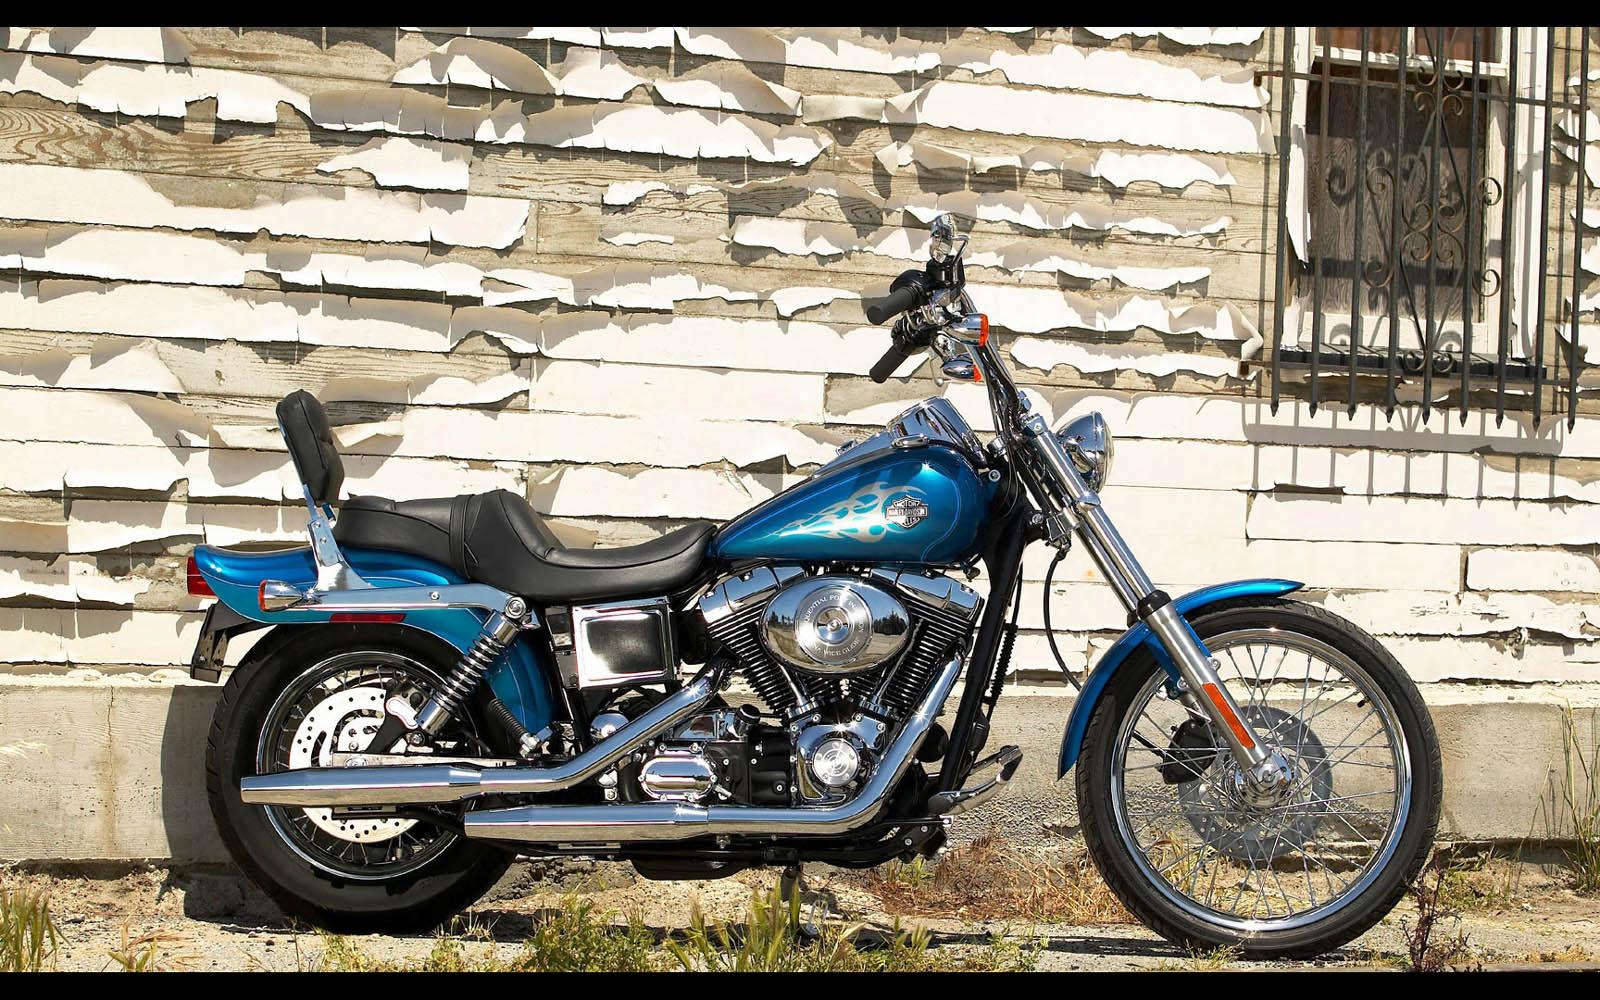 wallpapers harley davidson bikes wallpapers